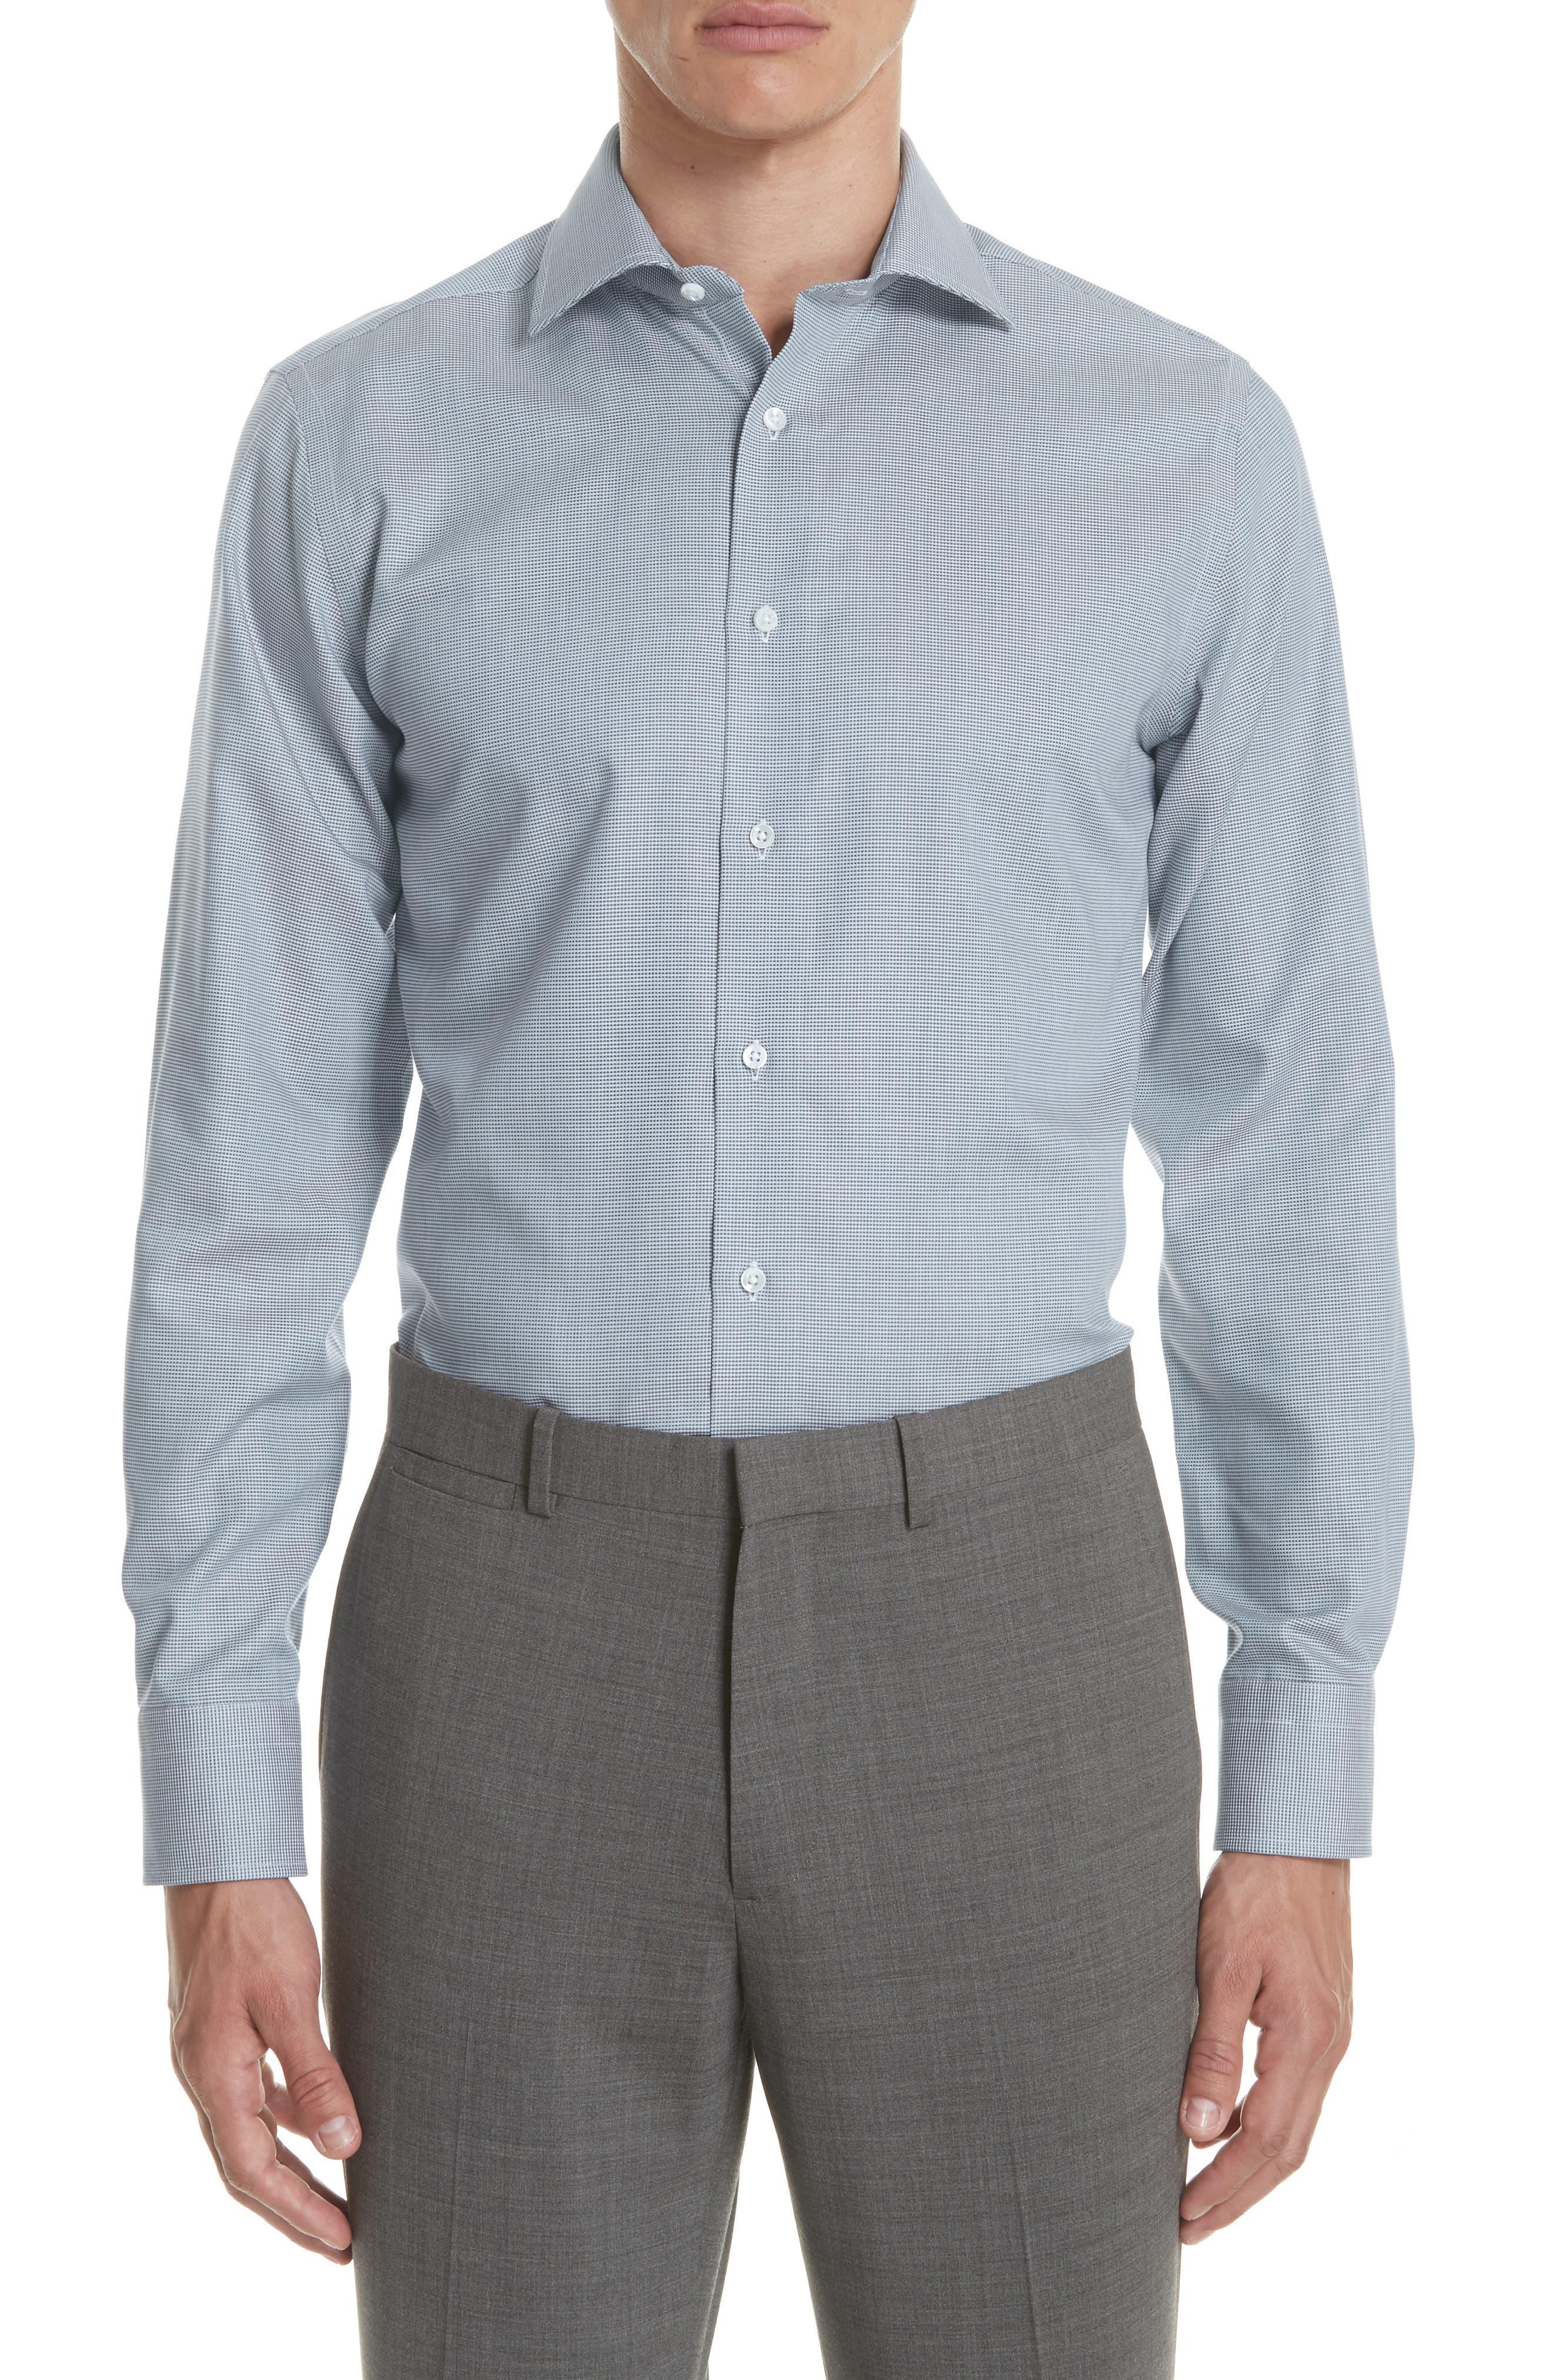 Regular Fit Solid Dress Shirt,                             Main thumbnail 1, color,                             200